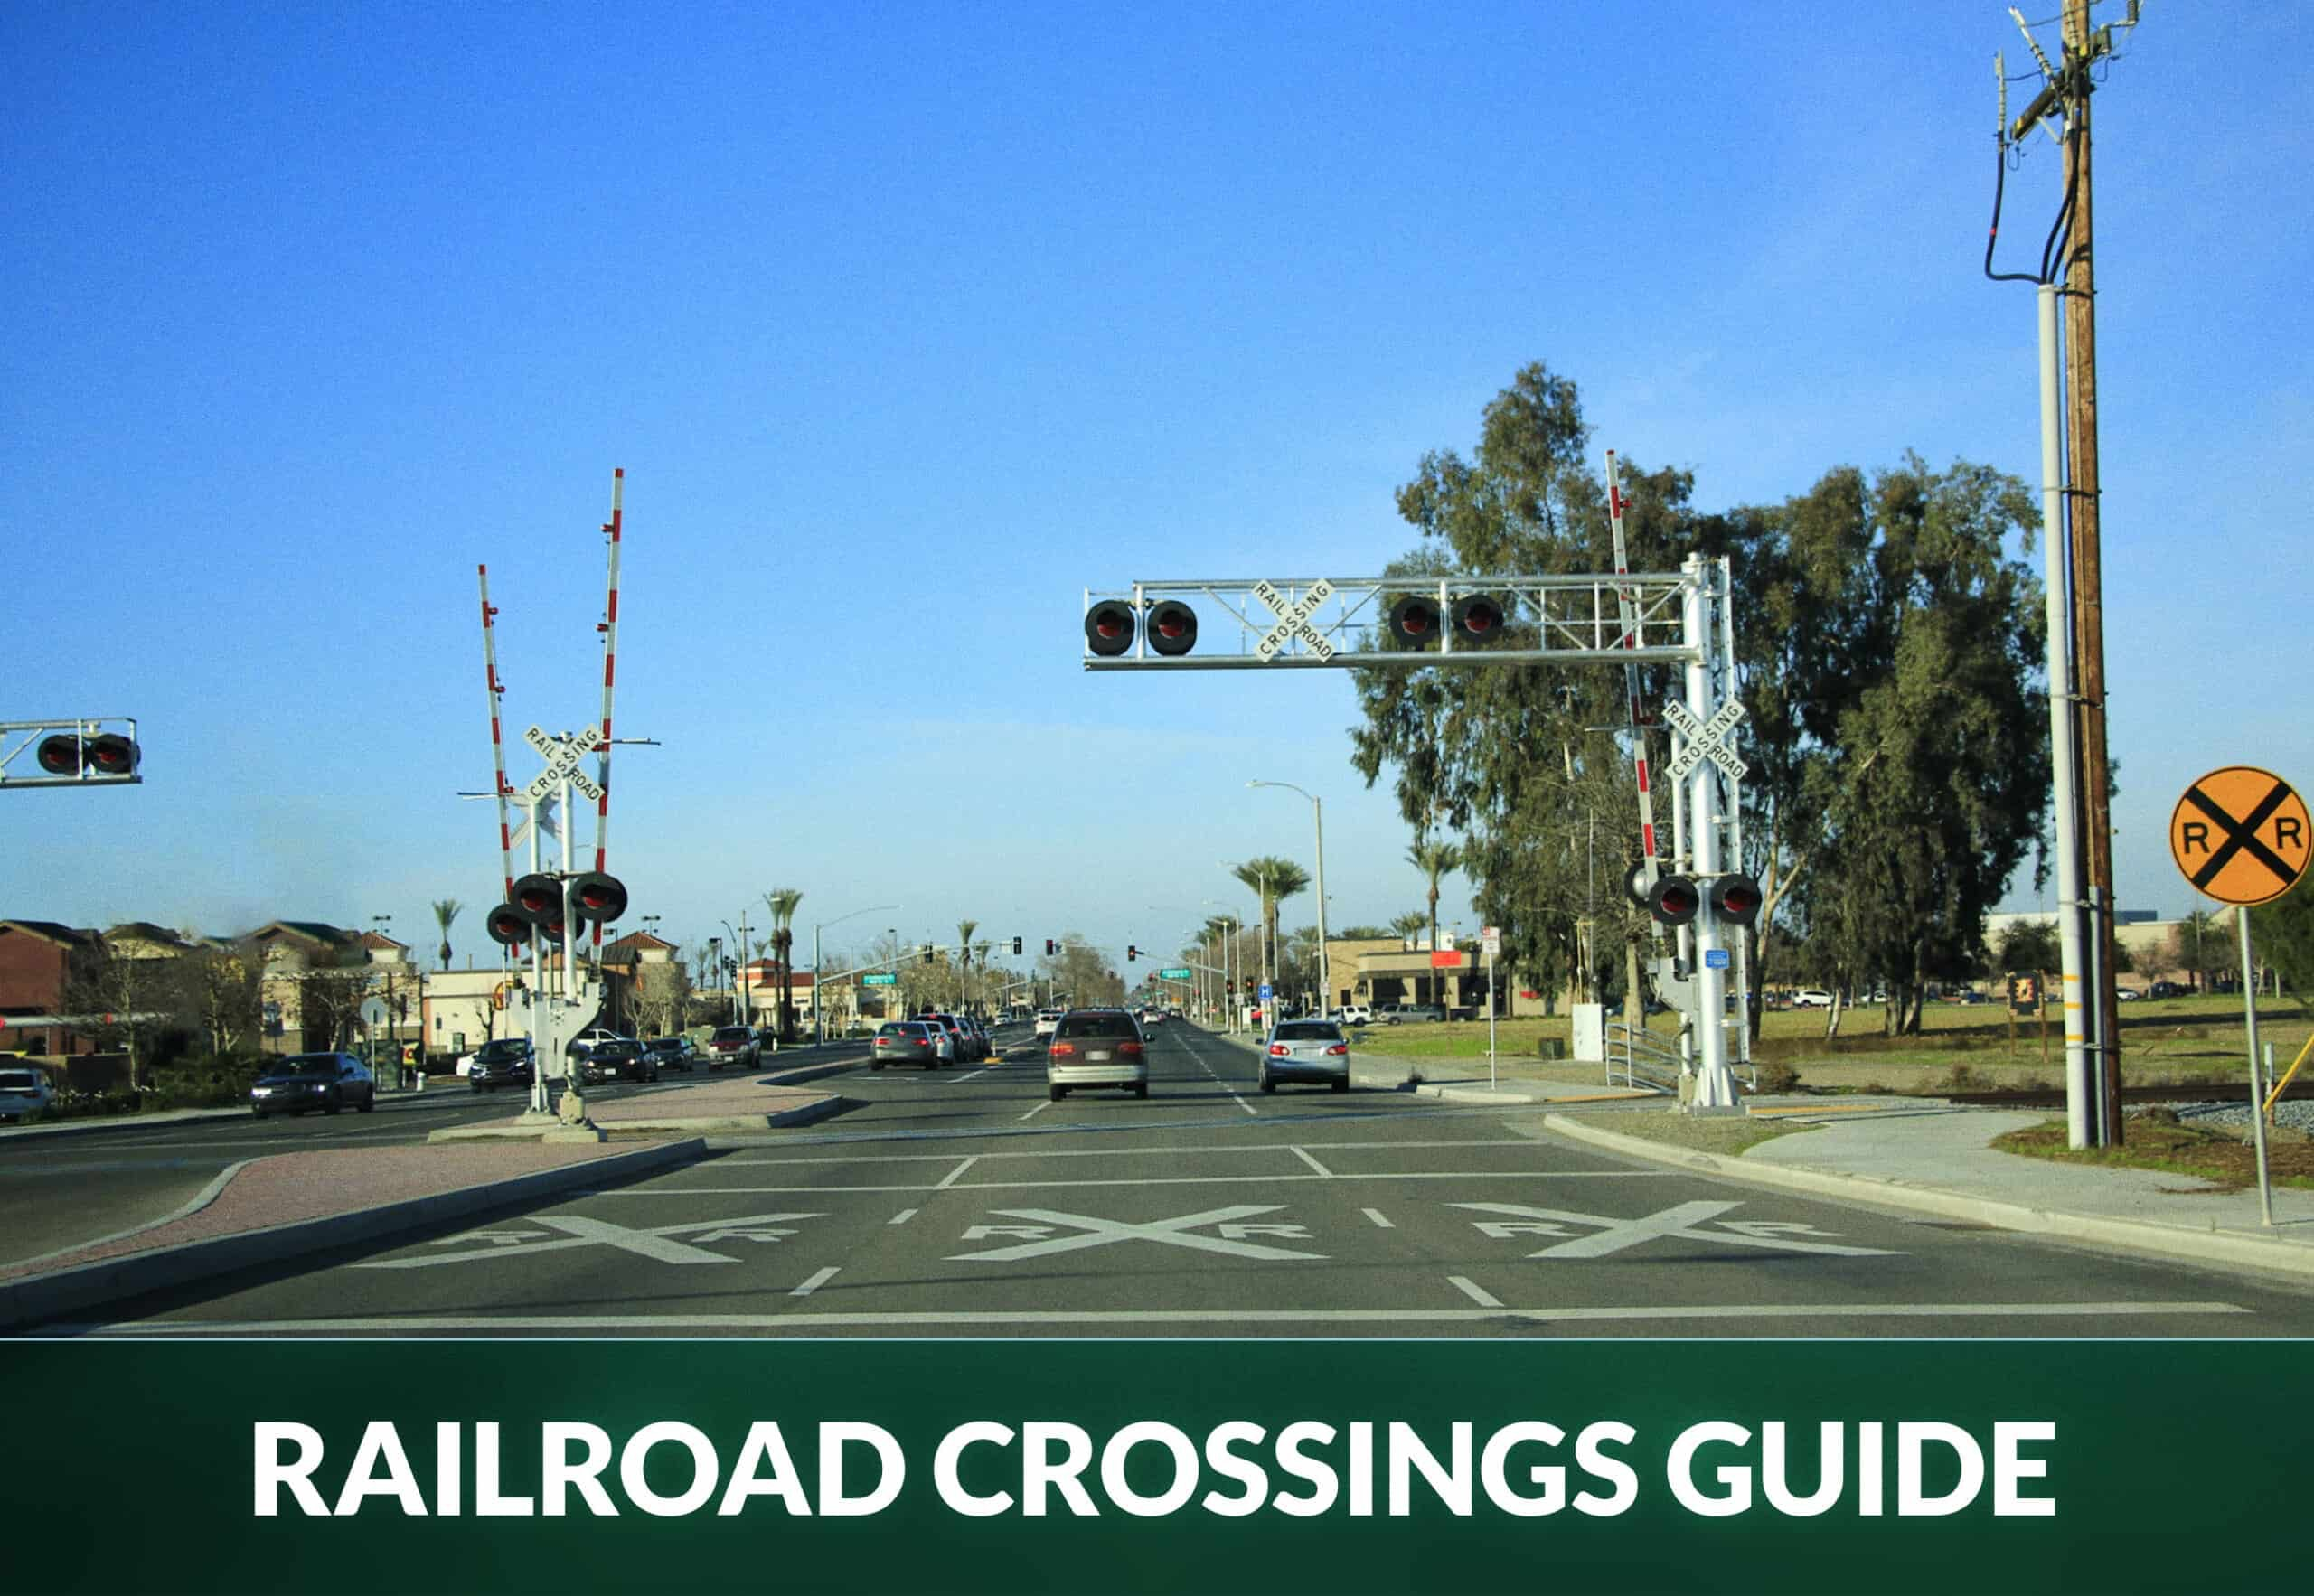 RAILROAD CROSSINGS GUIDE